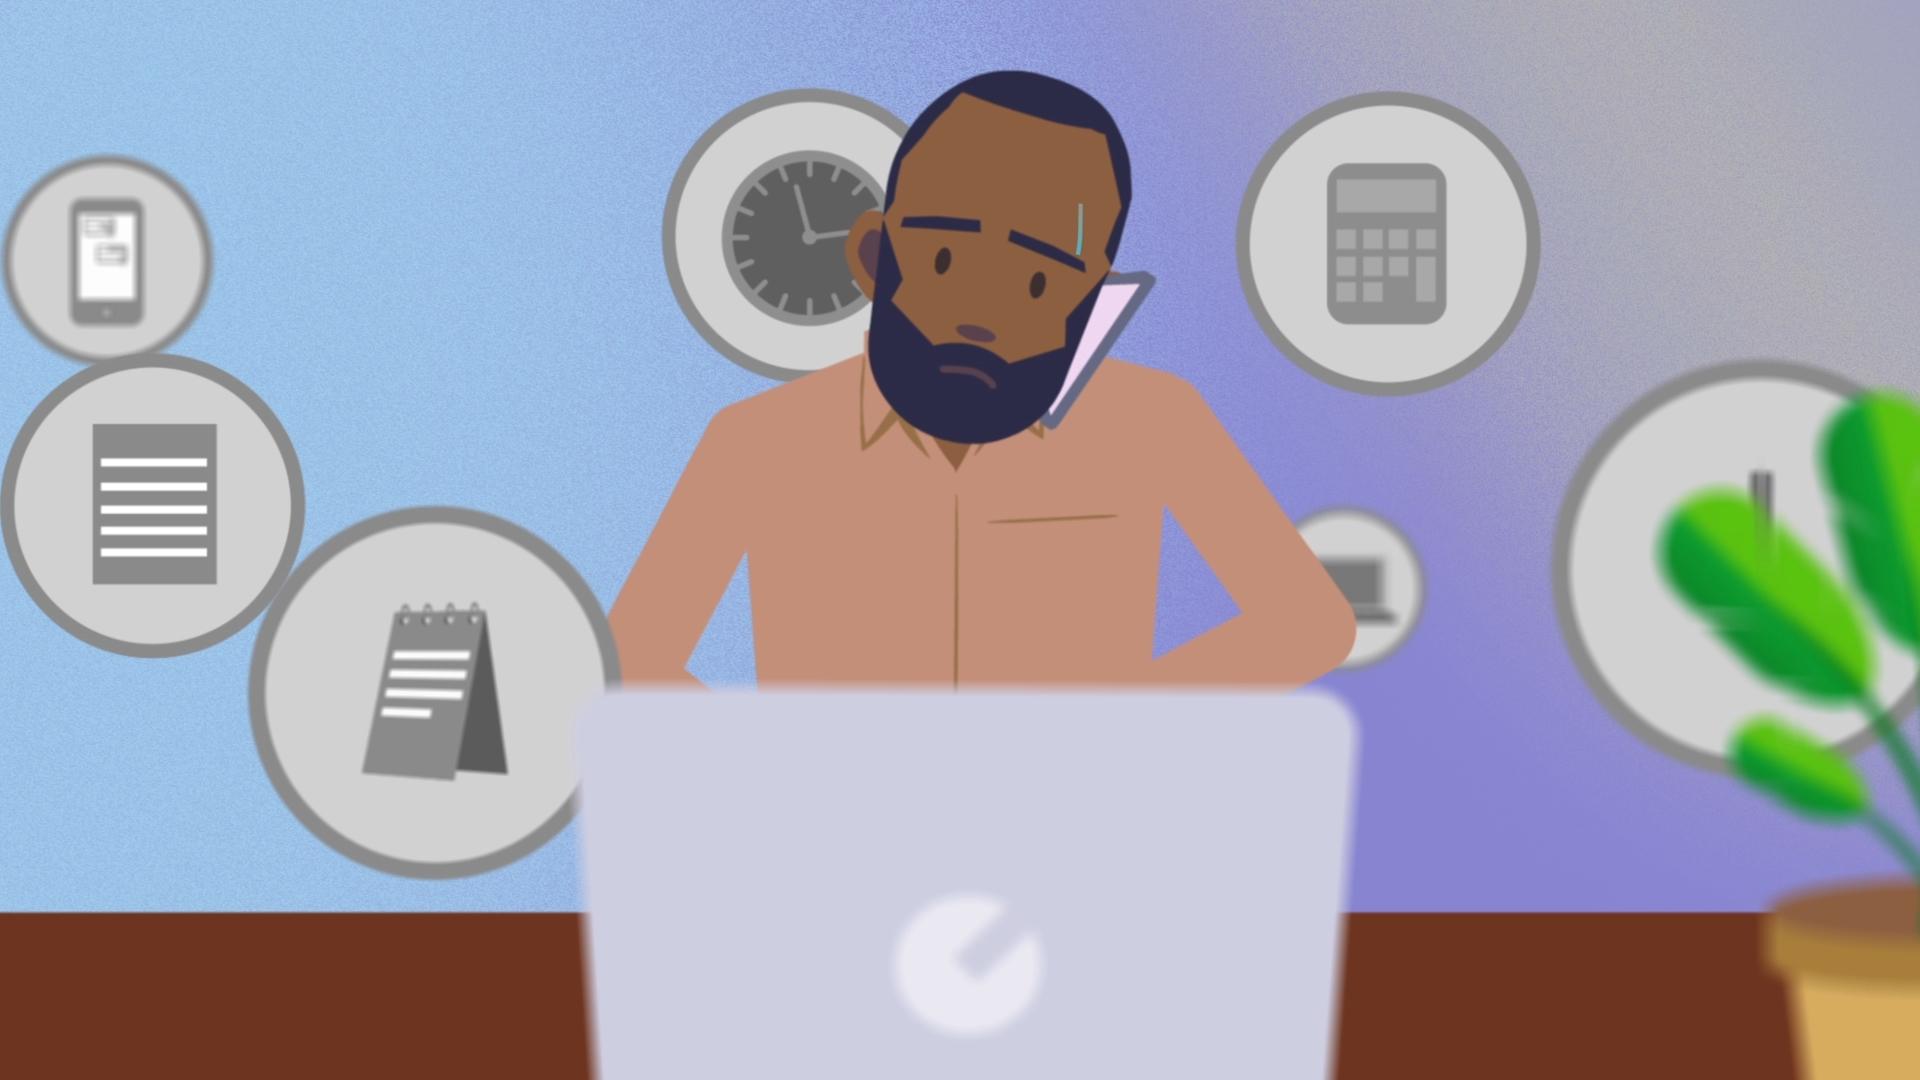 Wellers - Explainer video